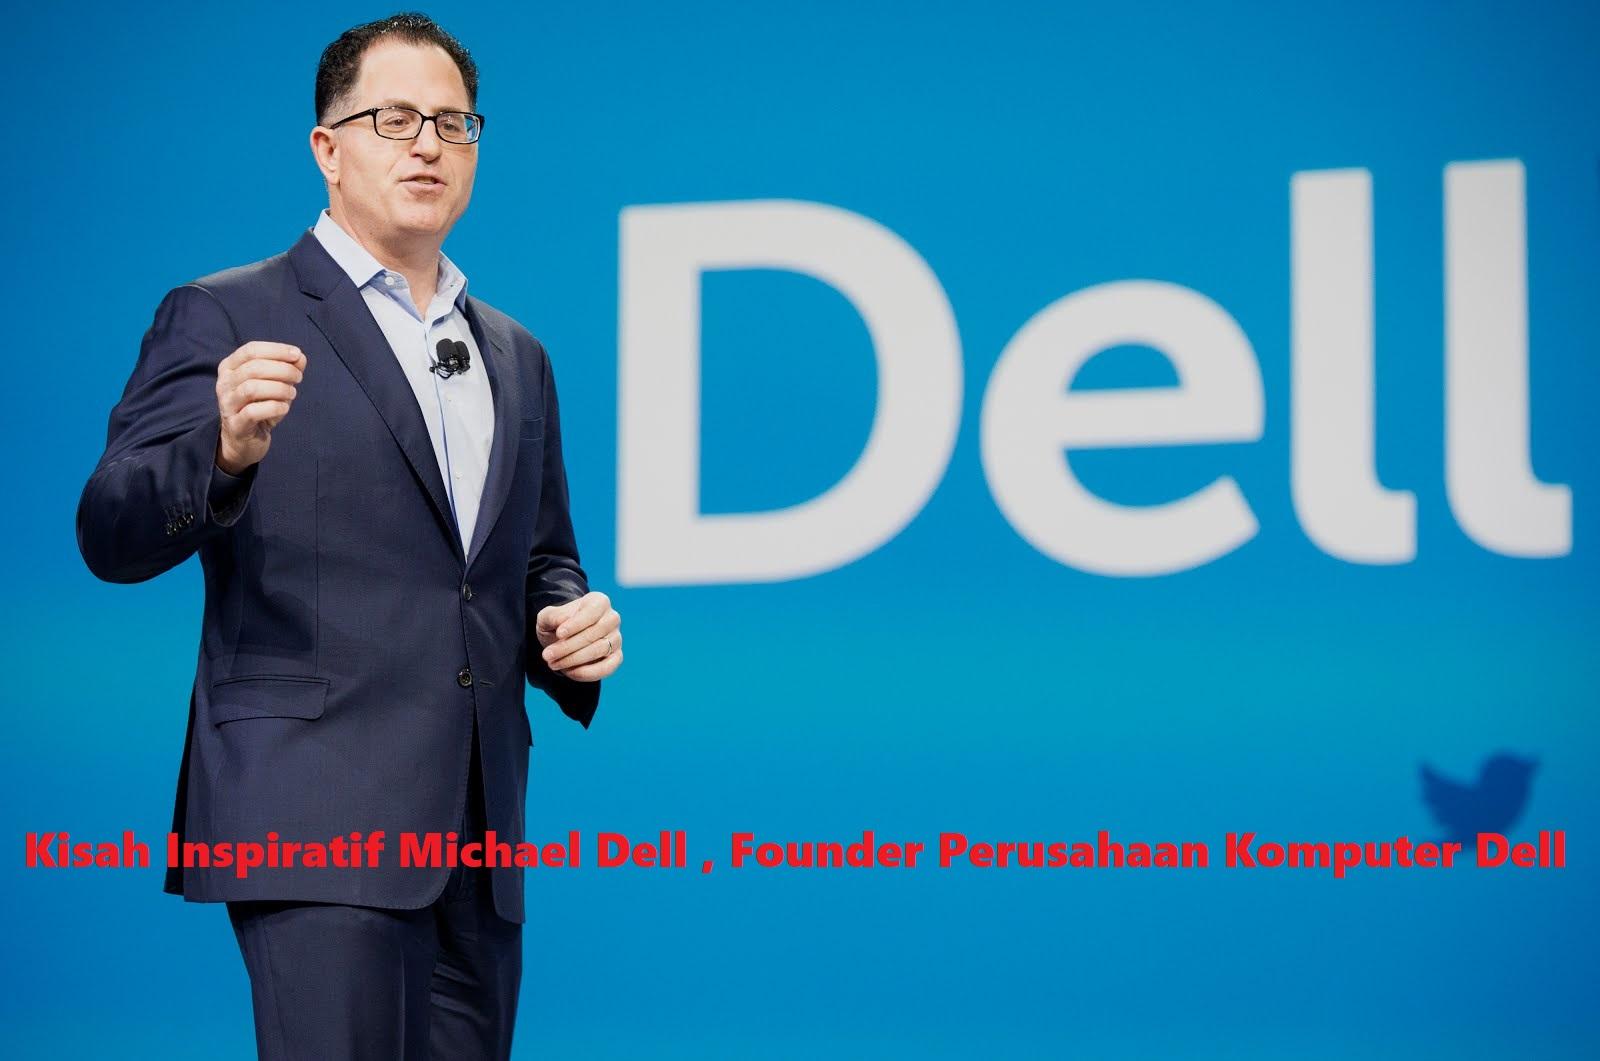 Kisah Inspiratif Michael Dell , Founder Perusahaan Komputer Dell